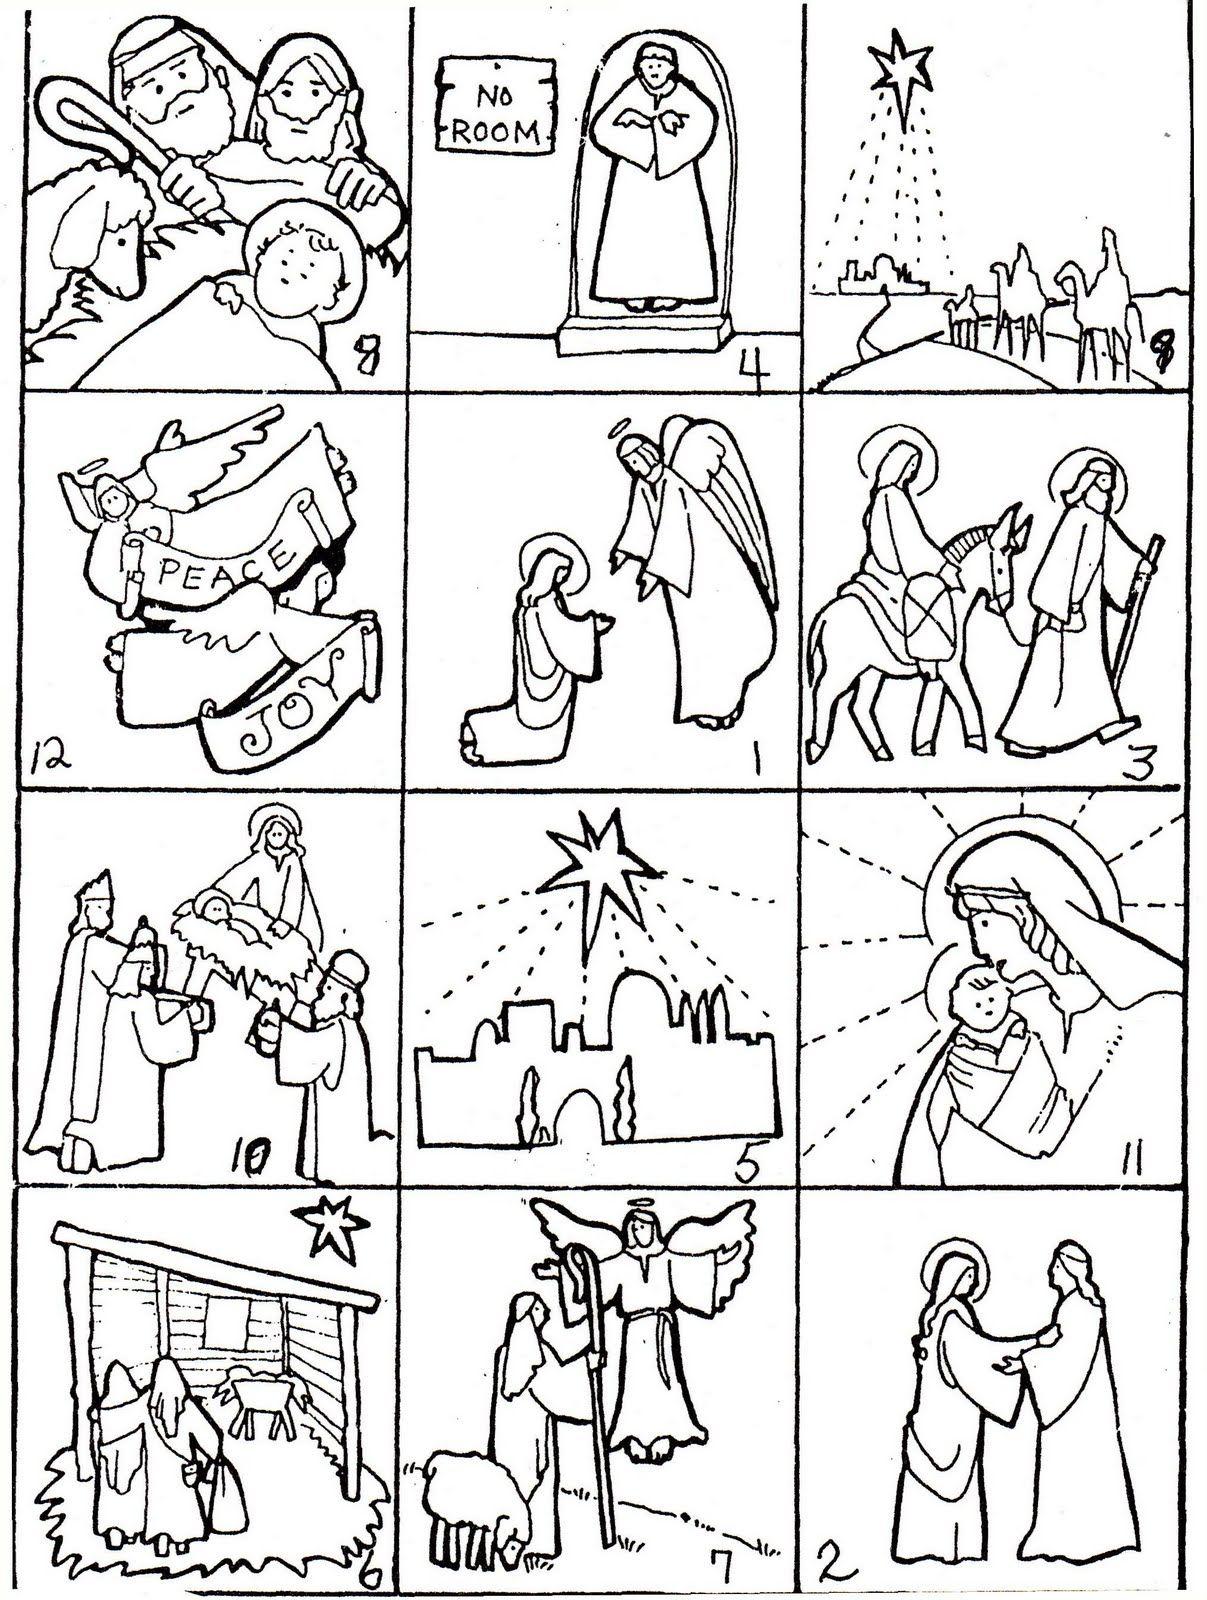 Elementary School Enrichment Activities: Christmas Story